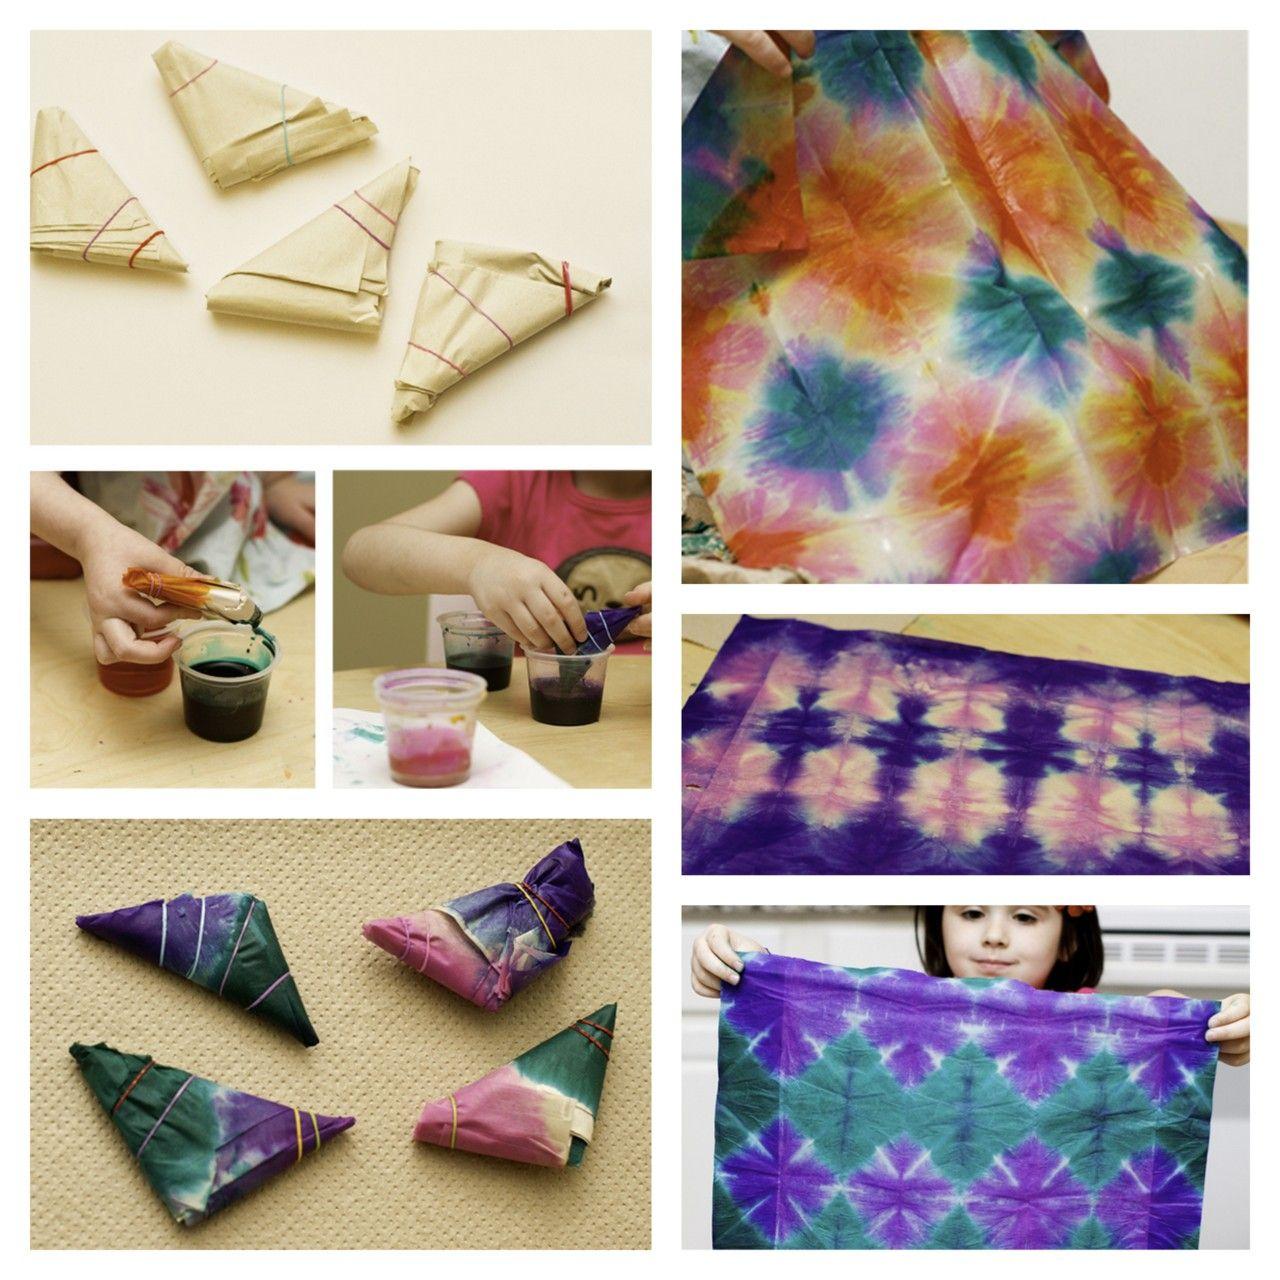 Rainbowsandunicornscrafts diy tie dye tissue create wonderful way to introduce kids to tie dye without using real dye tutorial from land of nod here baditri Gallery